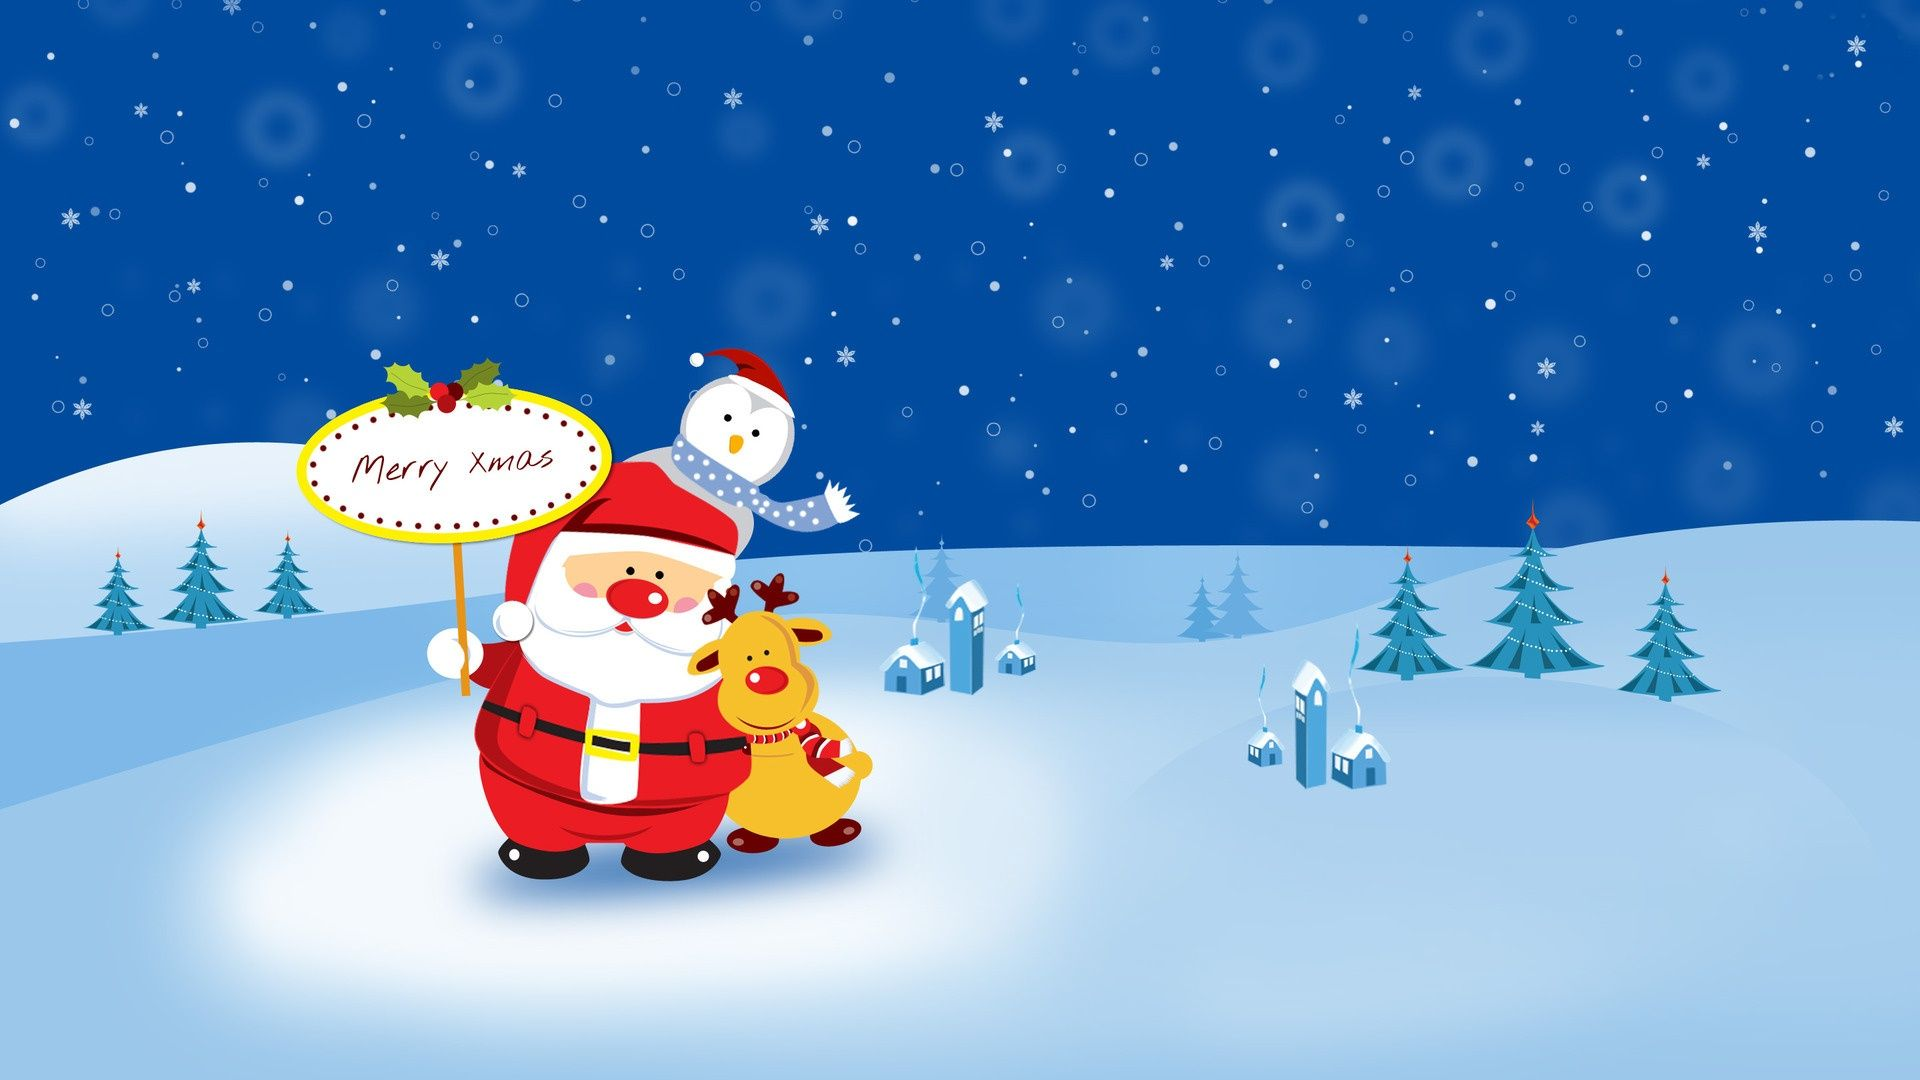 Cute Cartoon Christmas Images Cute Cartoon Christmas Wallpaper